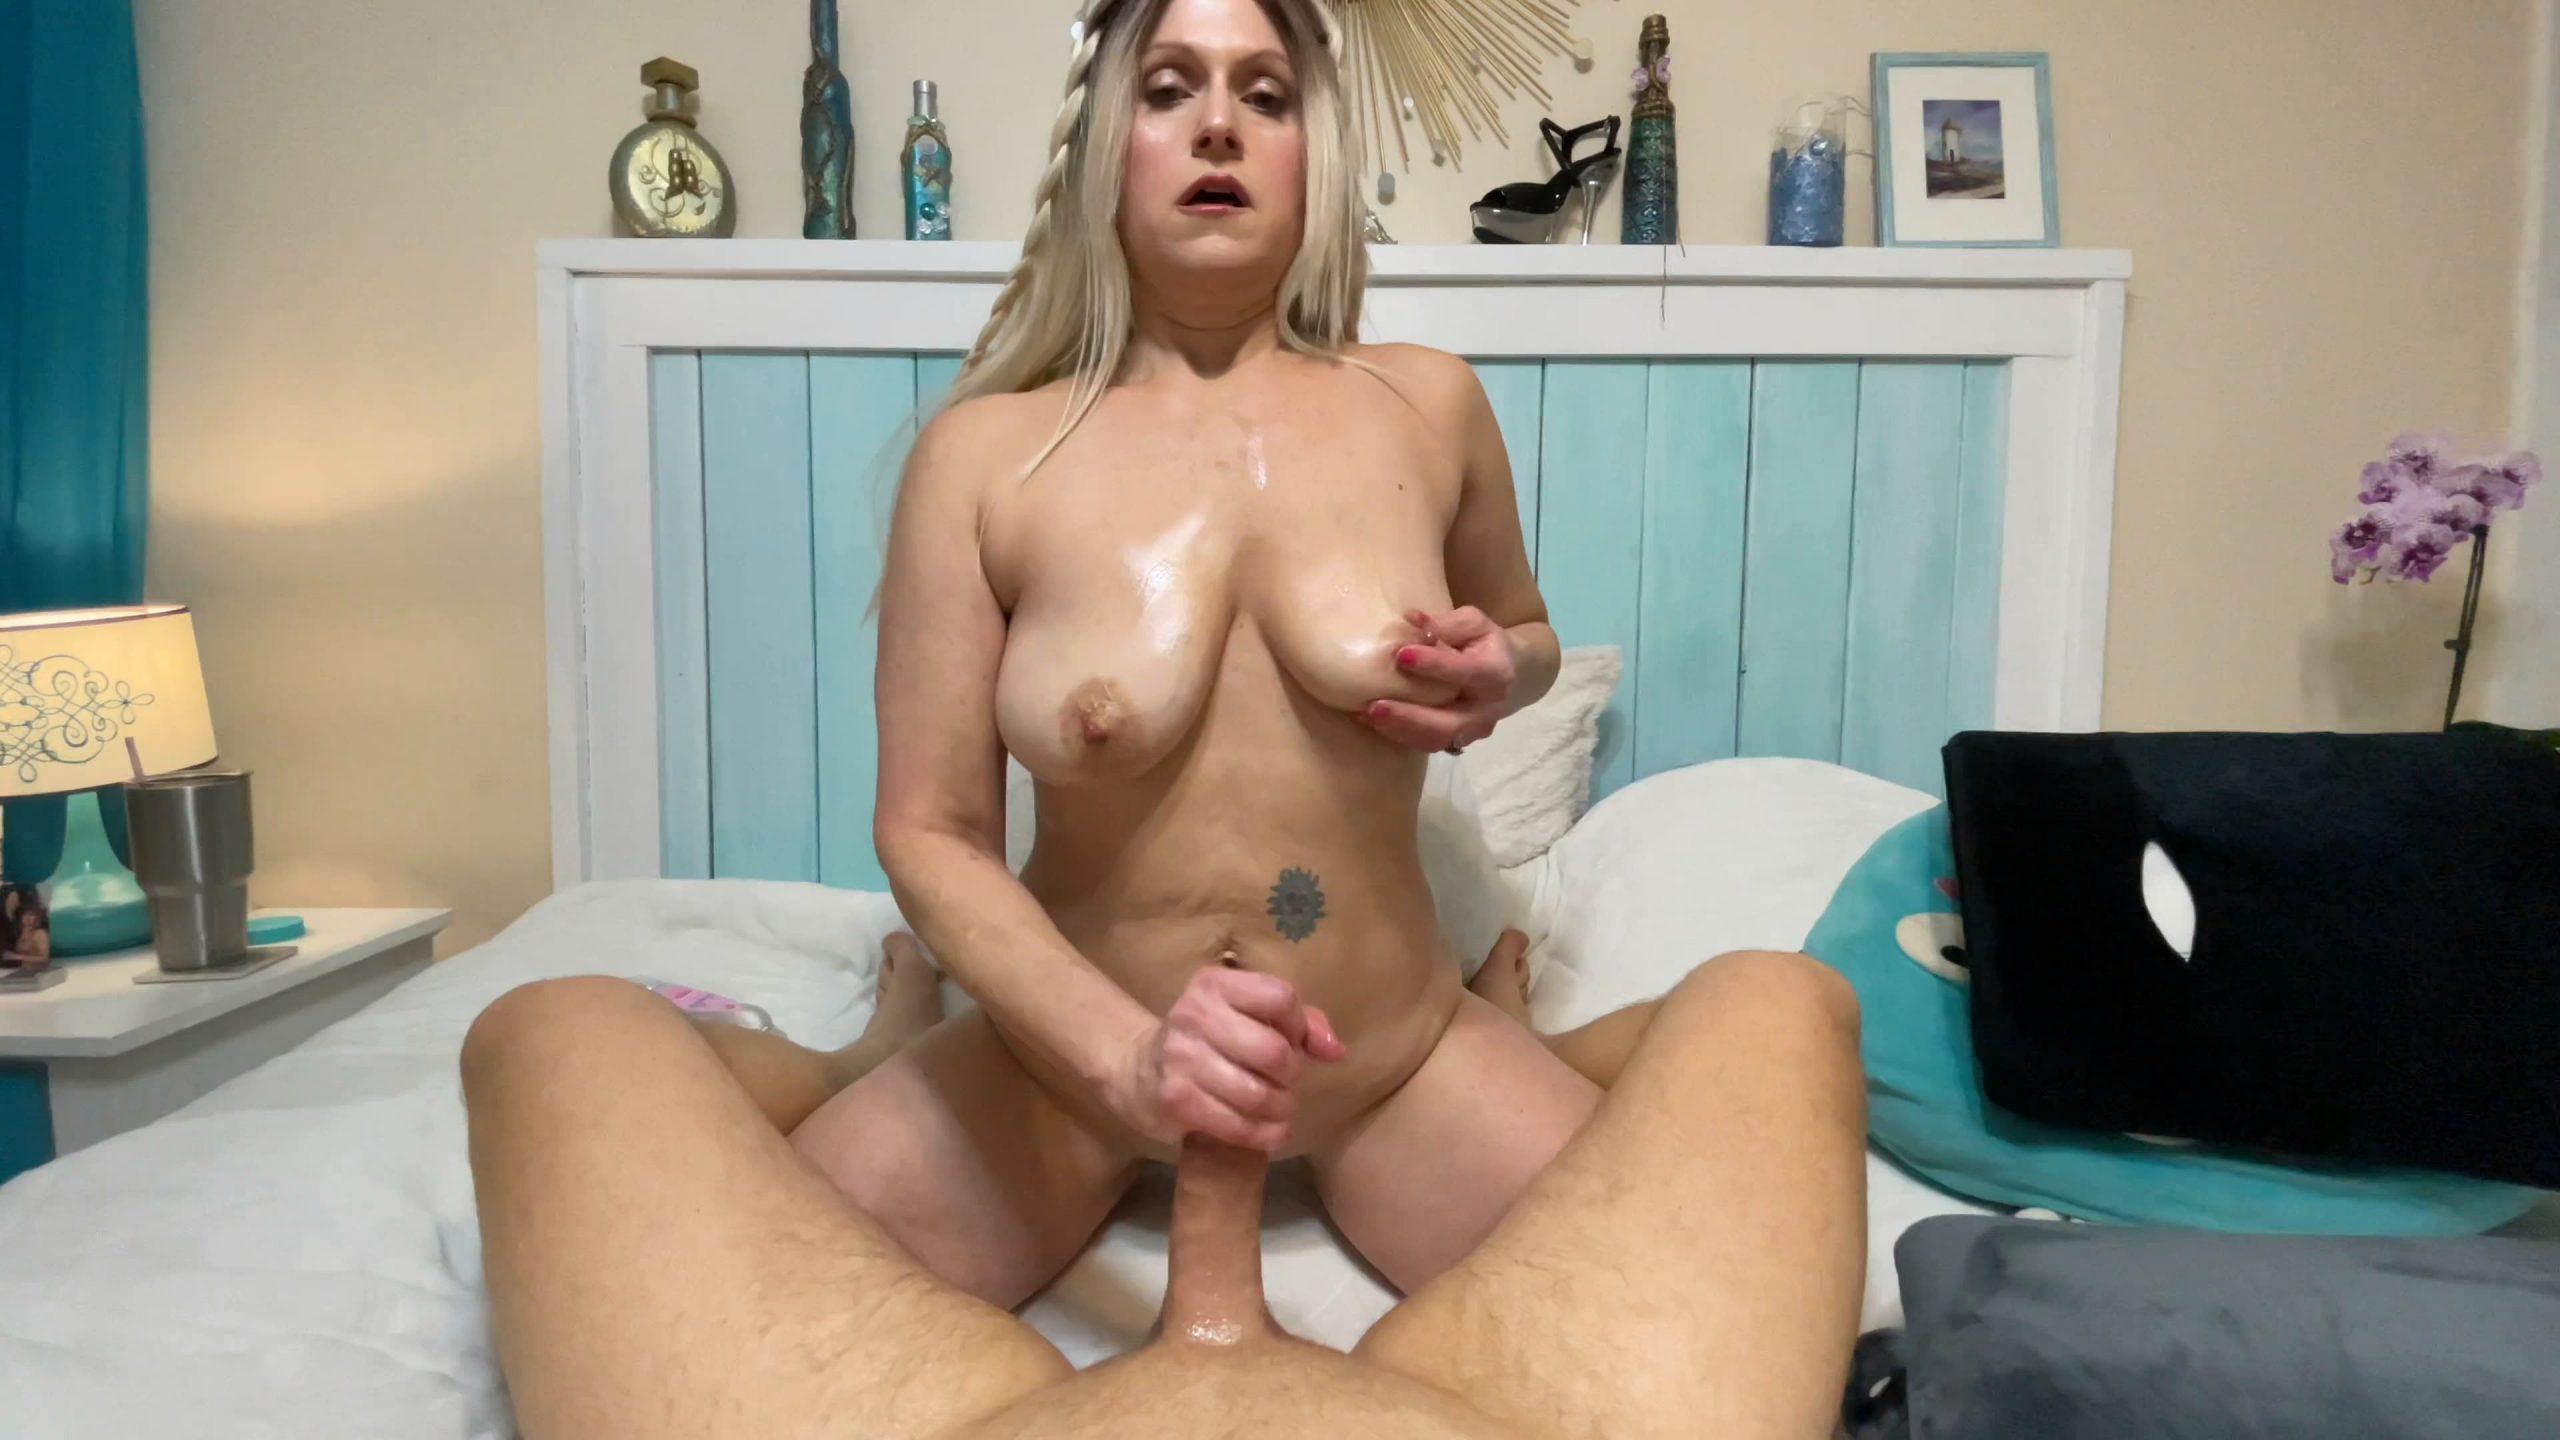 TabithaXXX - Mom Tests Foot Job Skills on Son